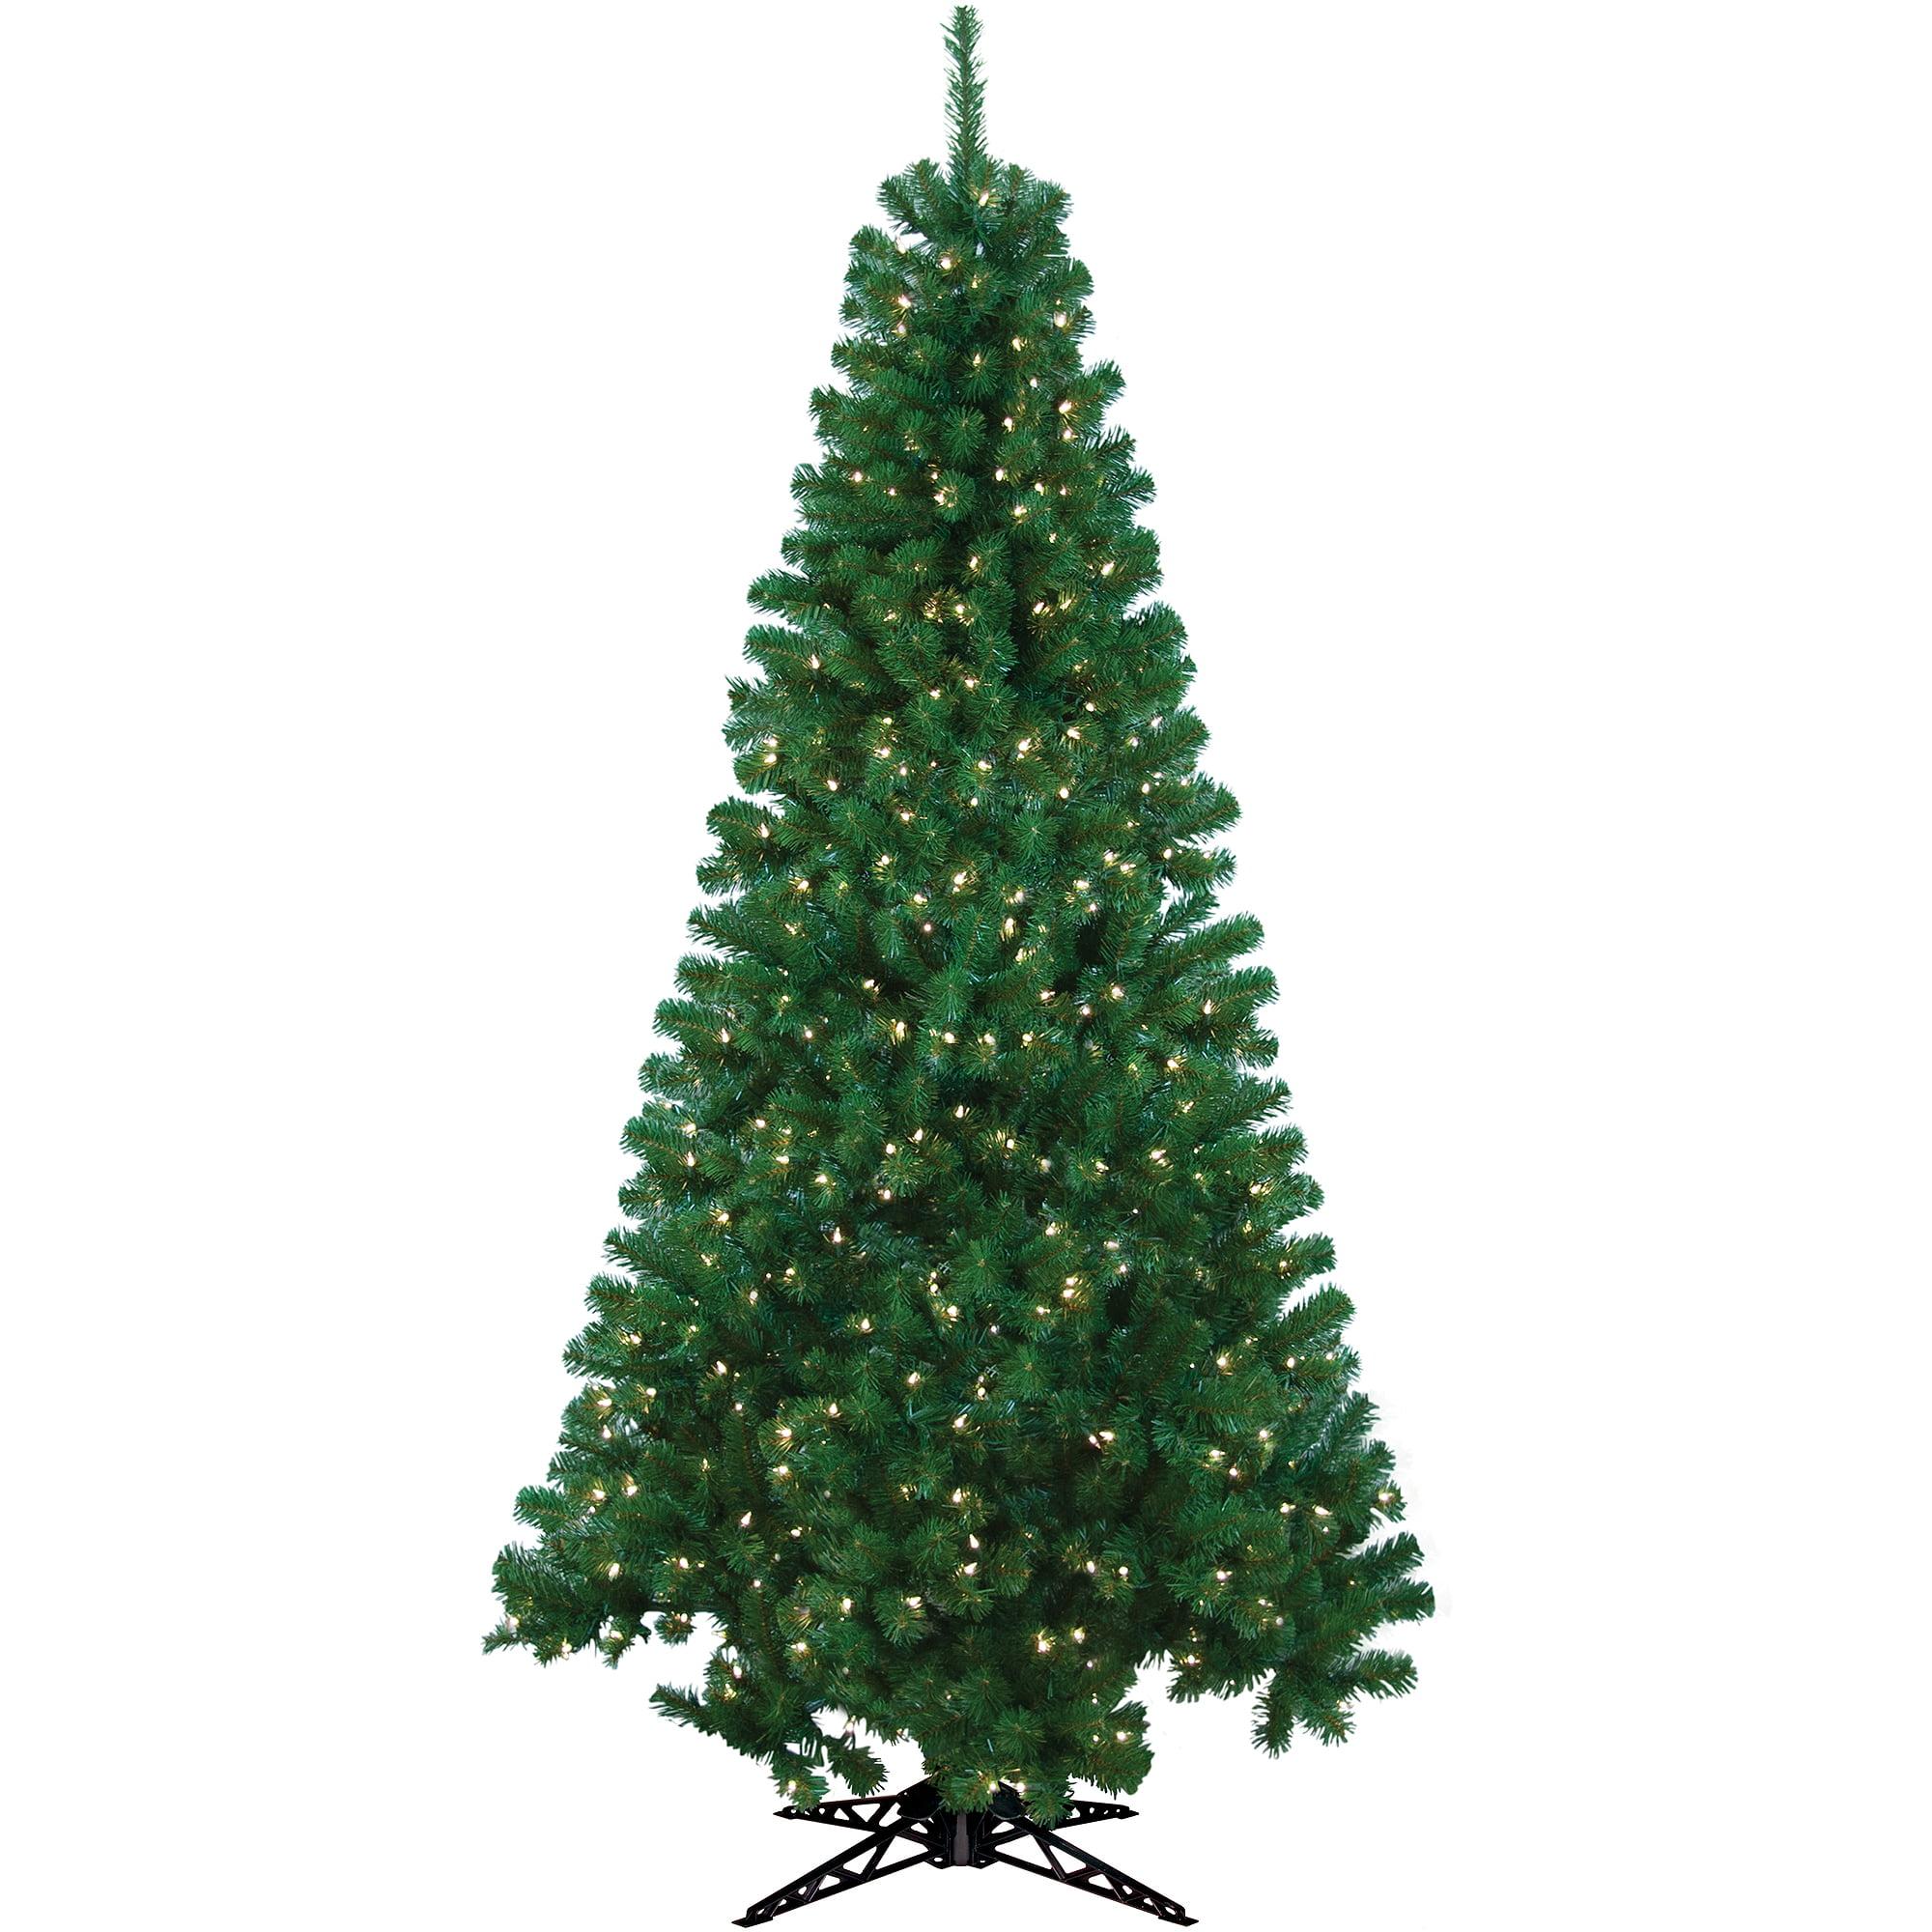 General Foam Plastics Corp Pre - Lit 6.5' Rockport Artificial Christmas Tree, 300 Clear Lights